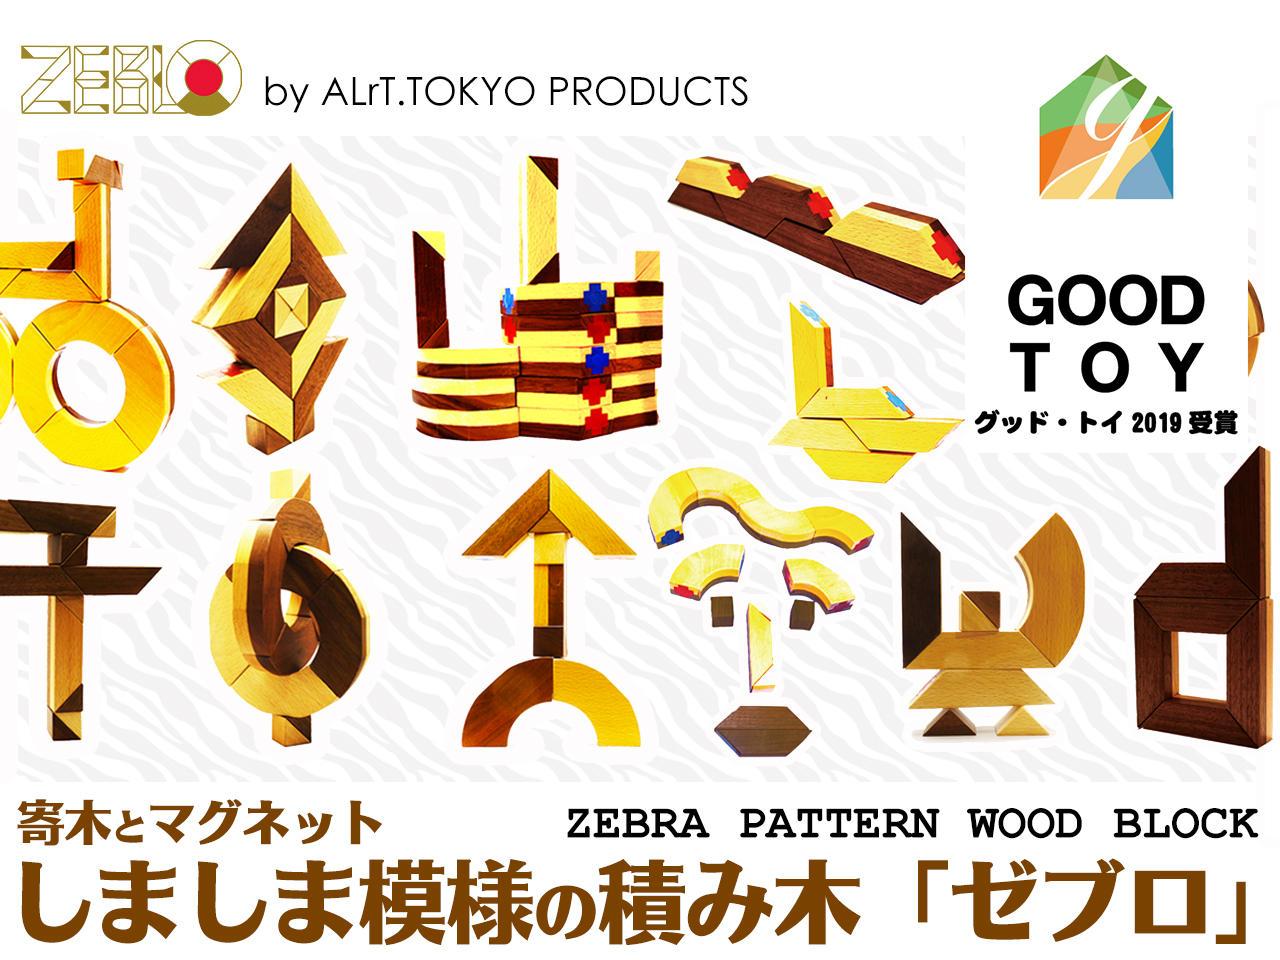 http://alrt.tokyo/news/ZEBLO_TOP_goodtoy.jpg